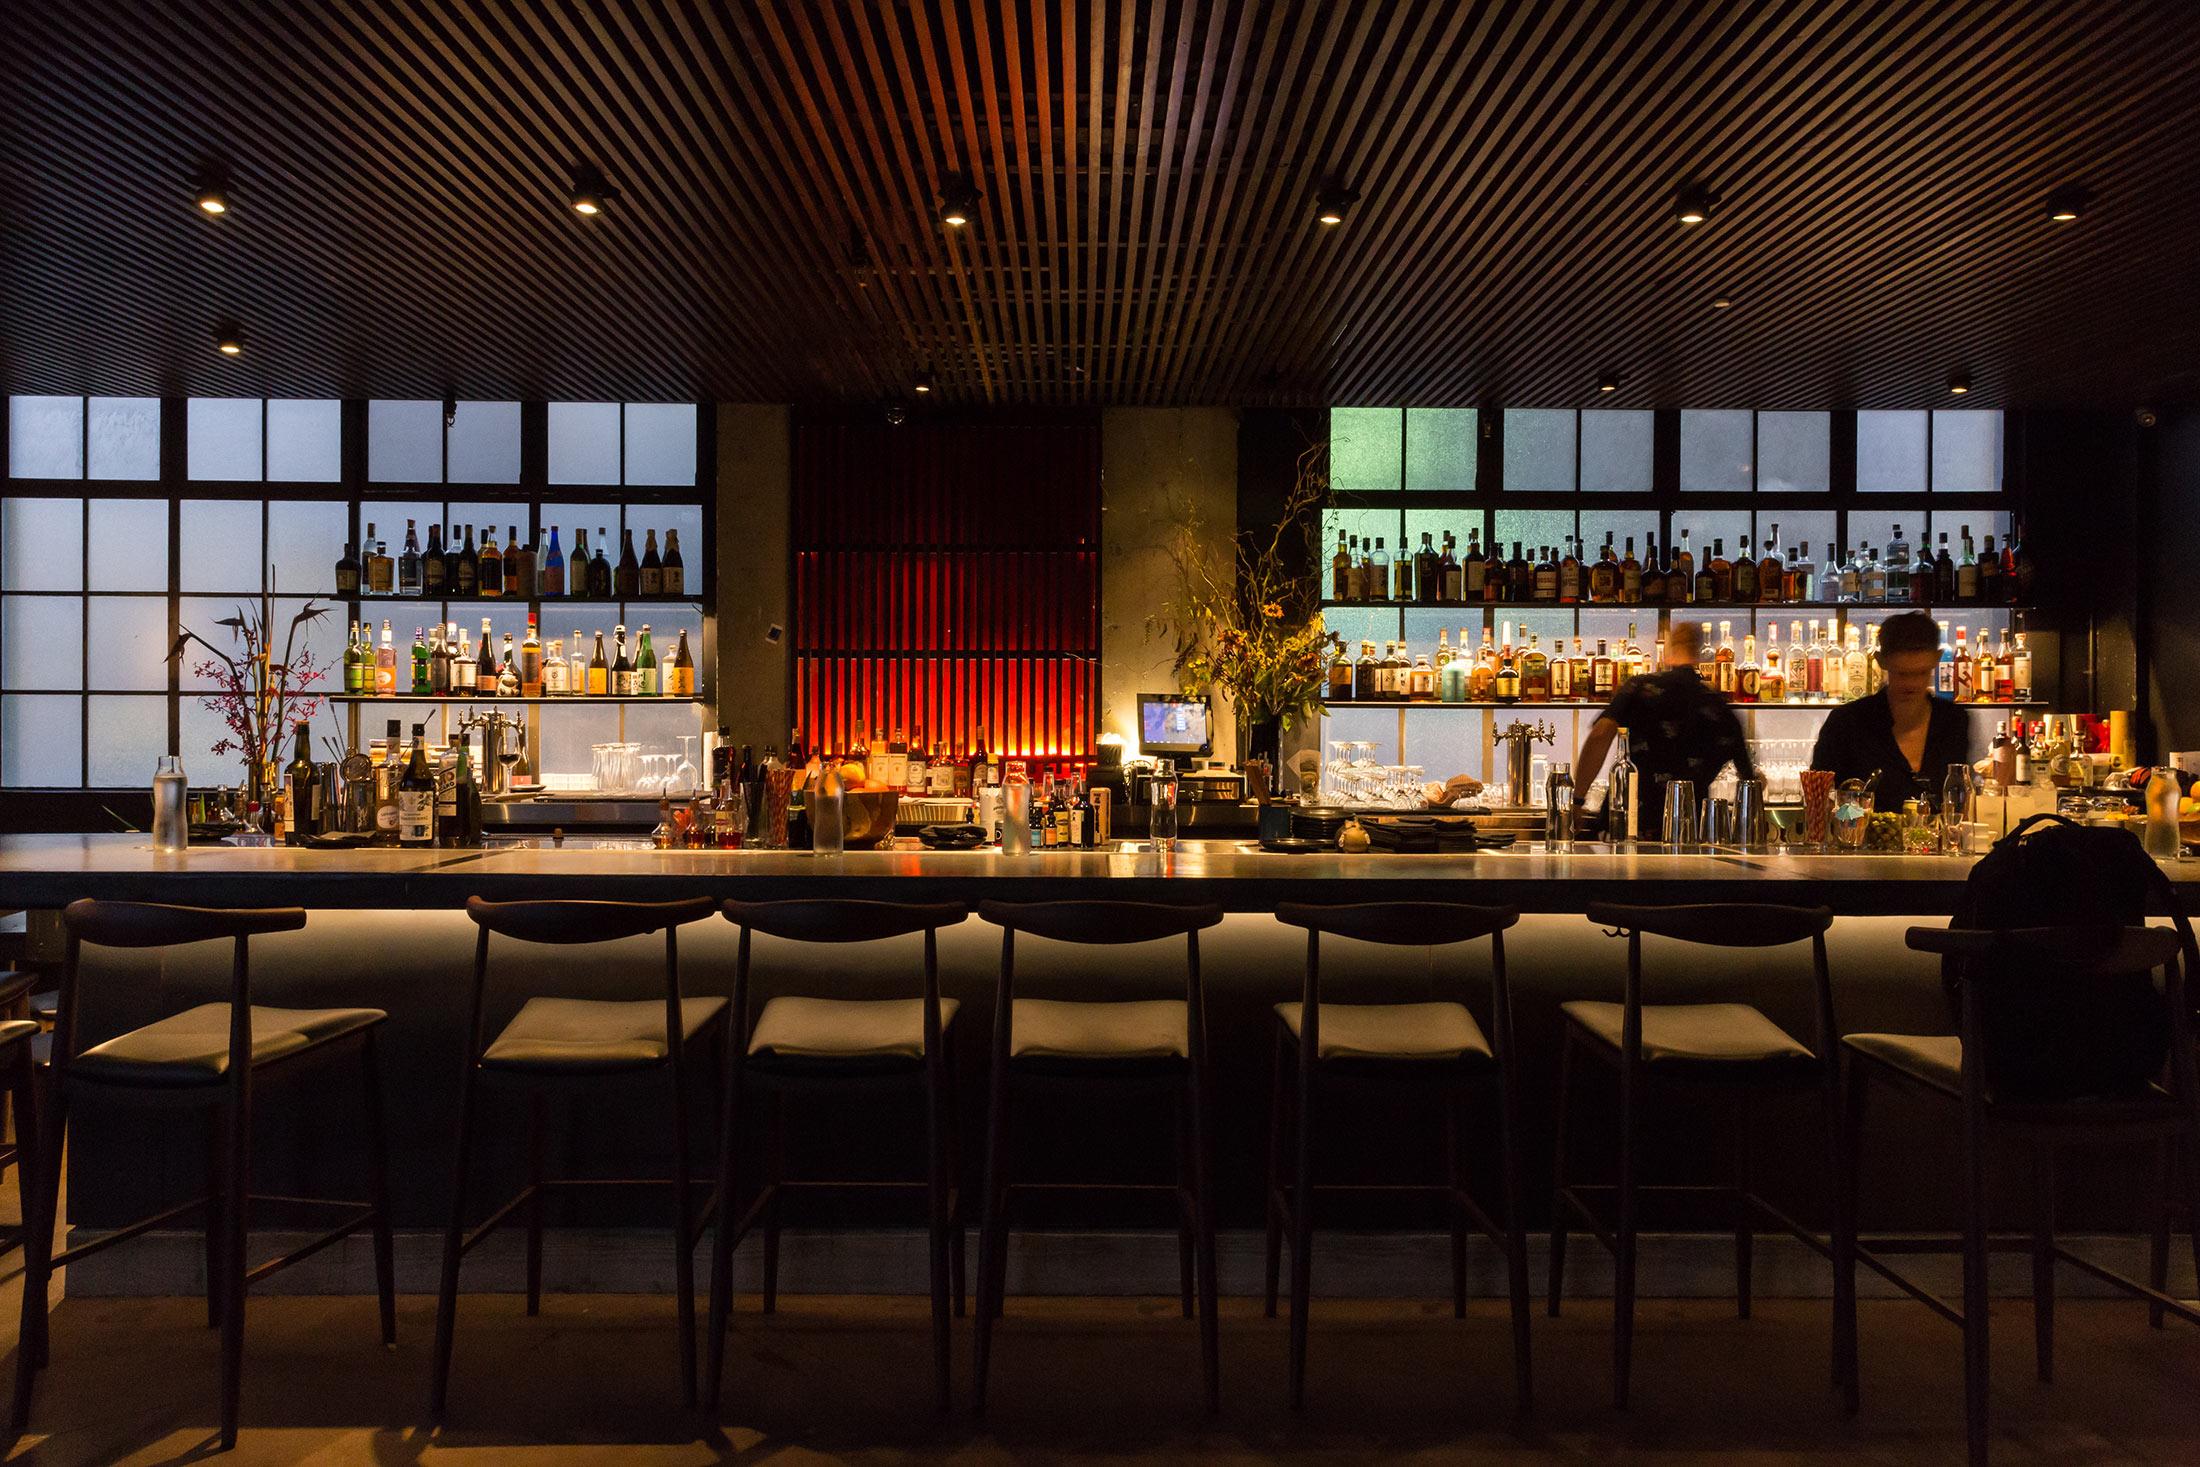 Shinmai Restaurant Bar with Slatted Roof Buestad Construction